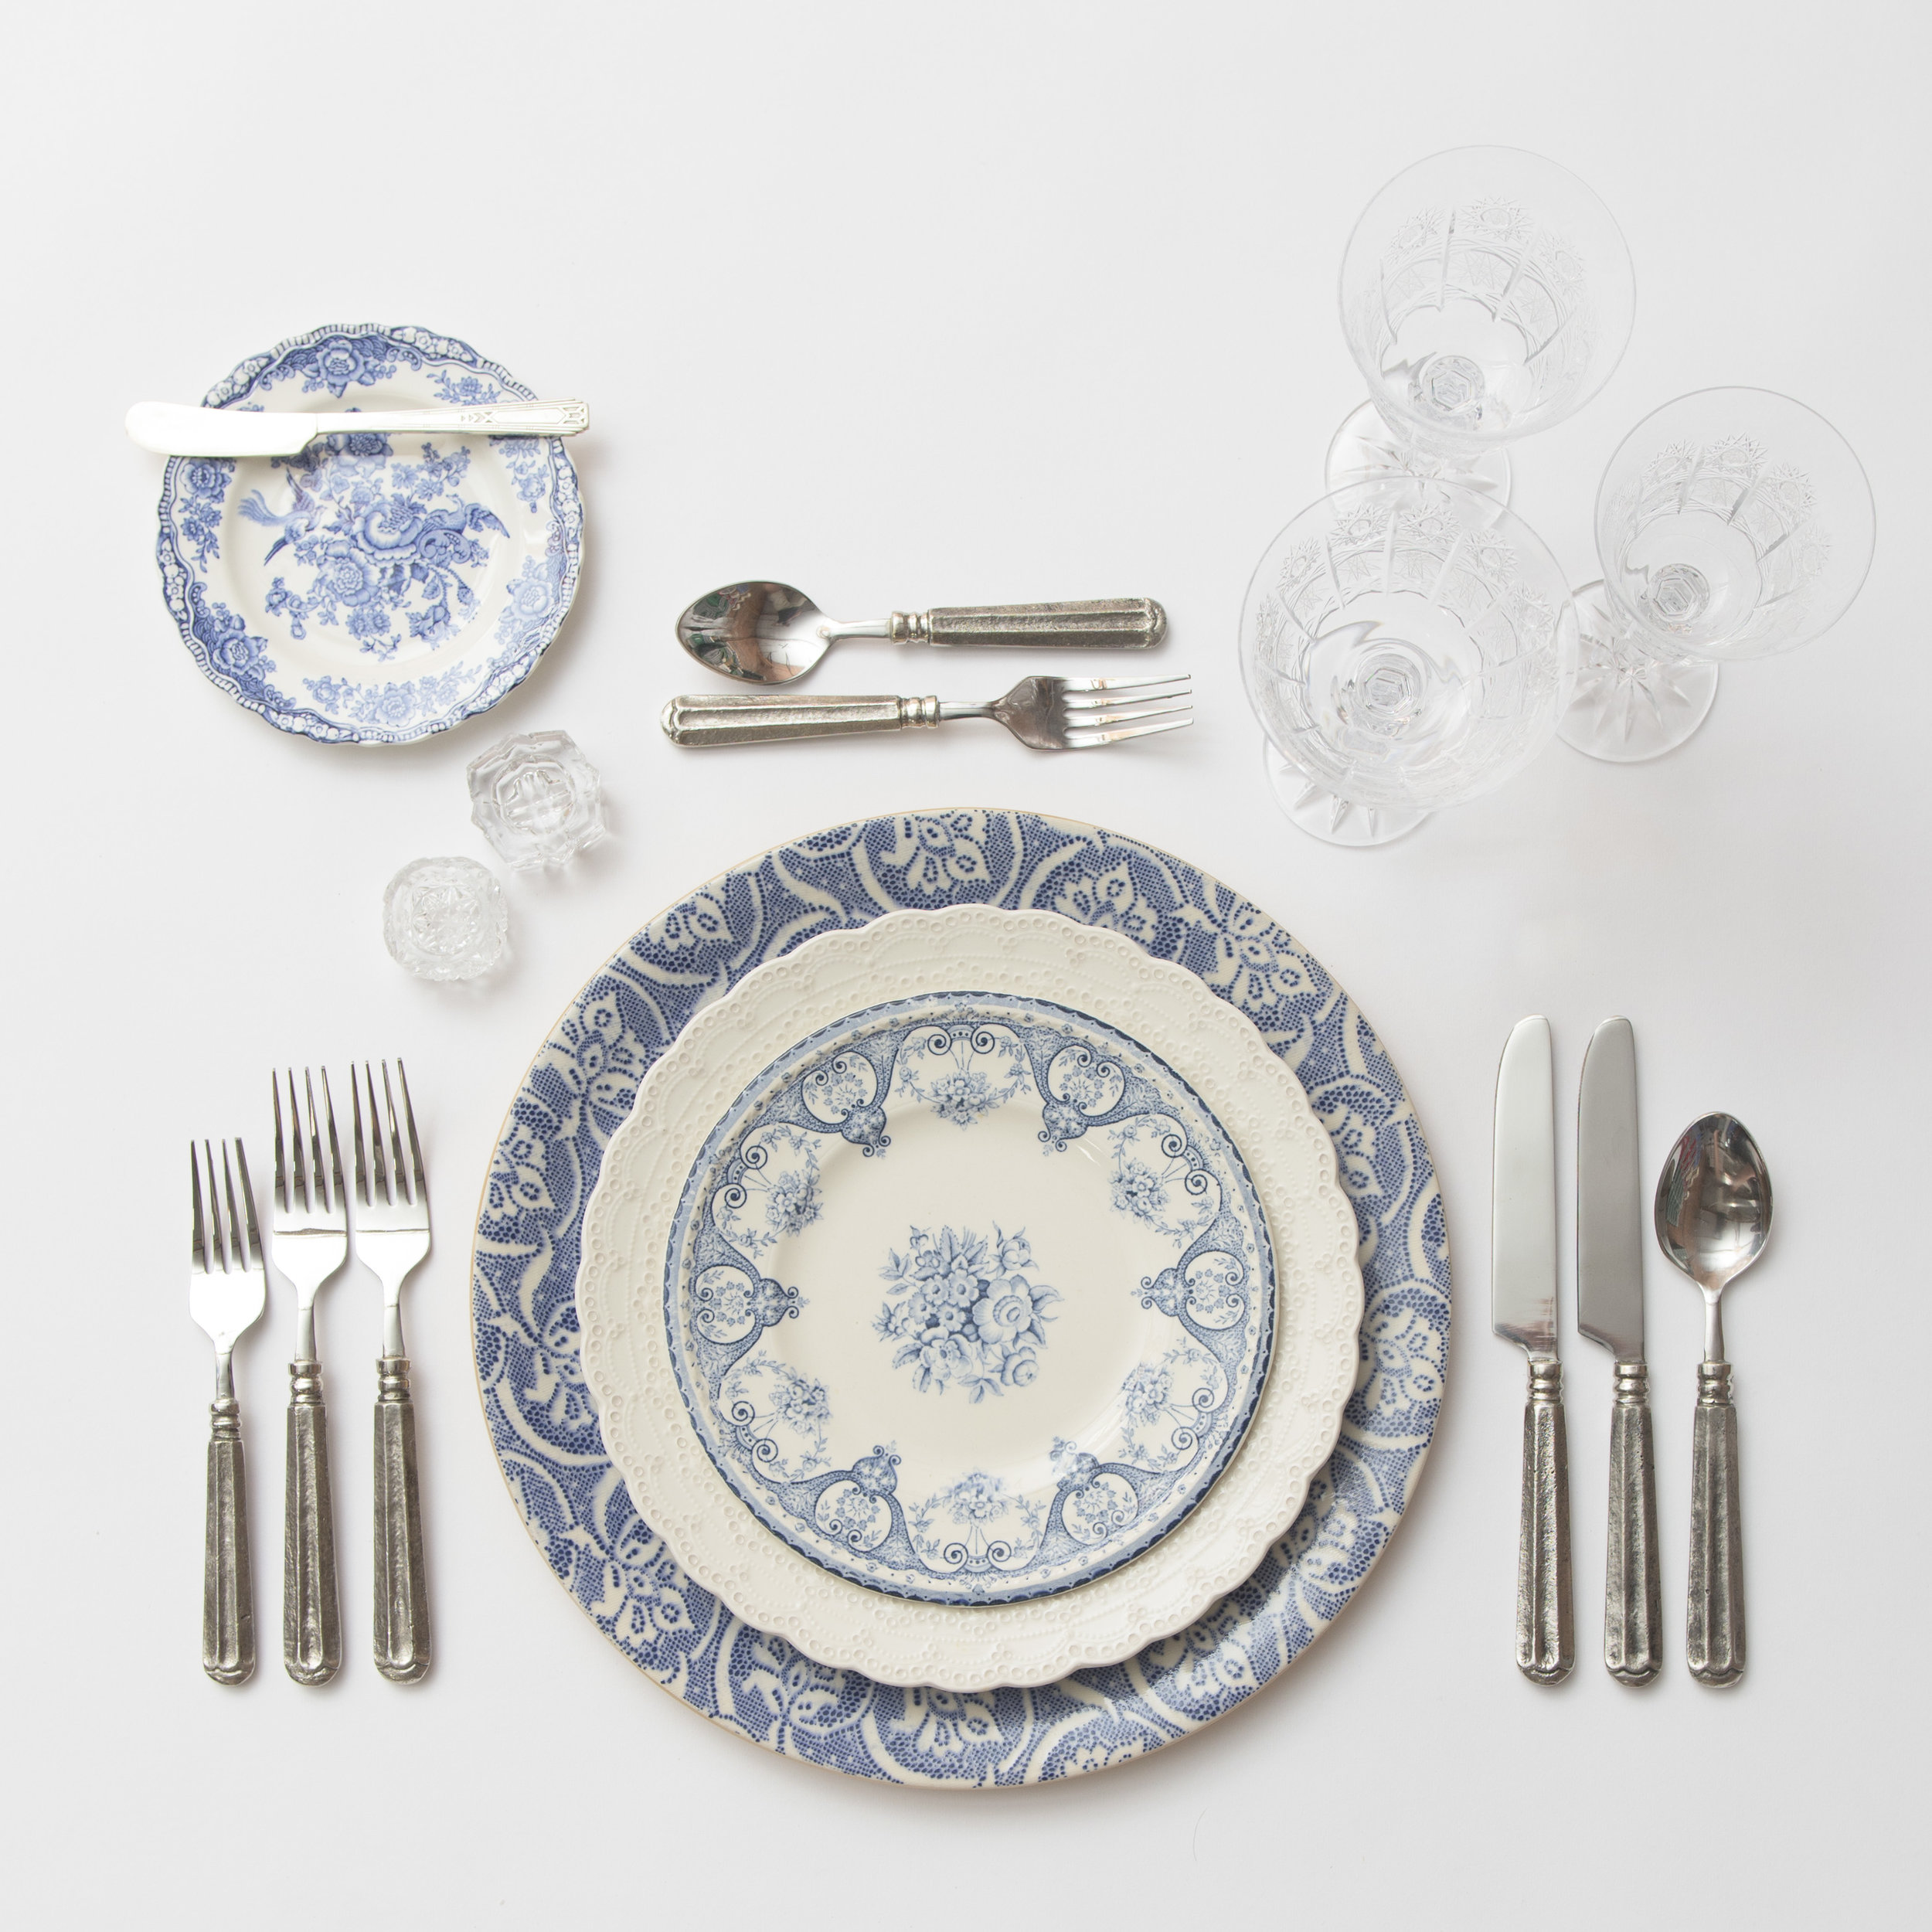 RENT: Blue Fleur de Lis Chargers + White Collection Vintage China + Blue Garden Collection Vintage China + Tuscan Flatware in Pewter + Czech Crystal Stemware + Antique Crystal Salt Cellars